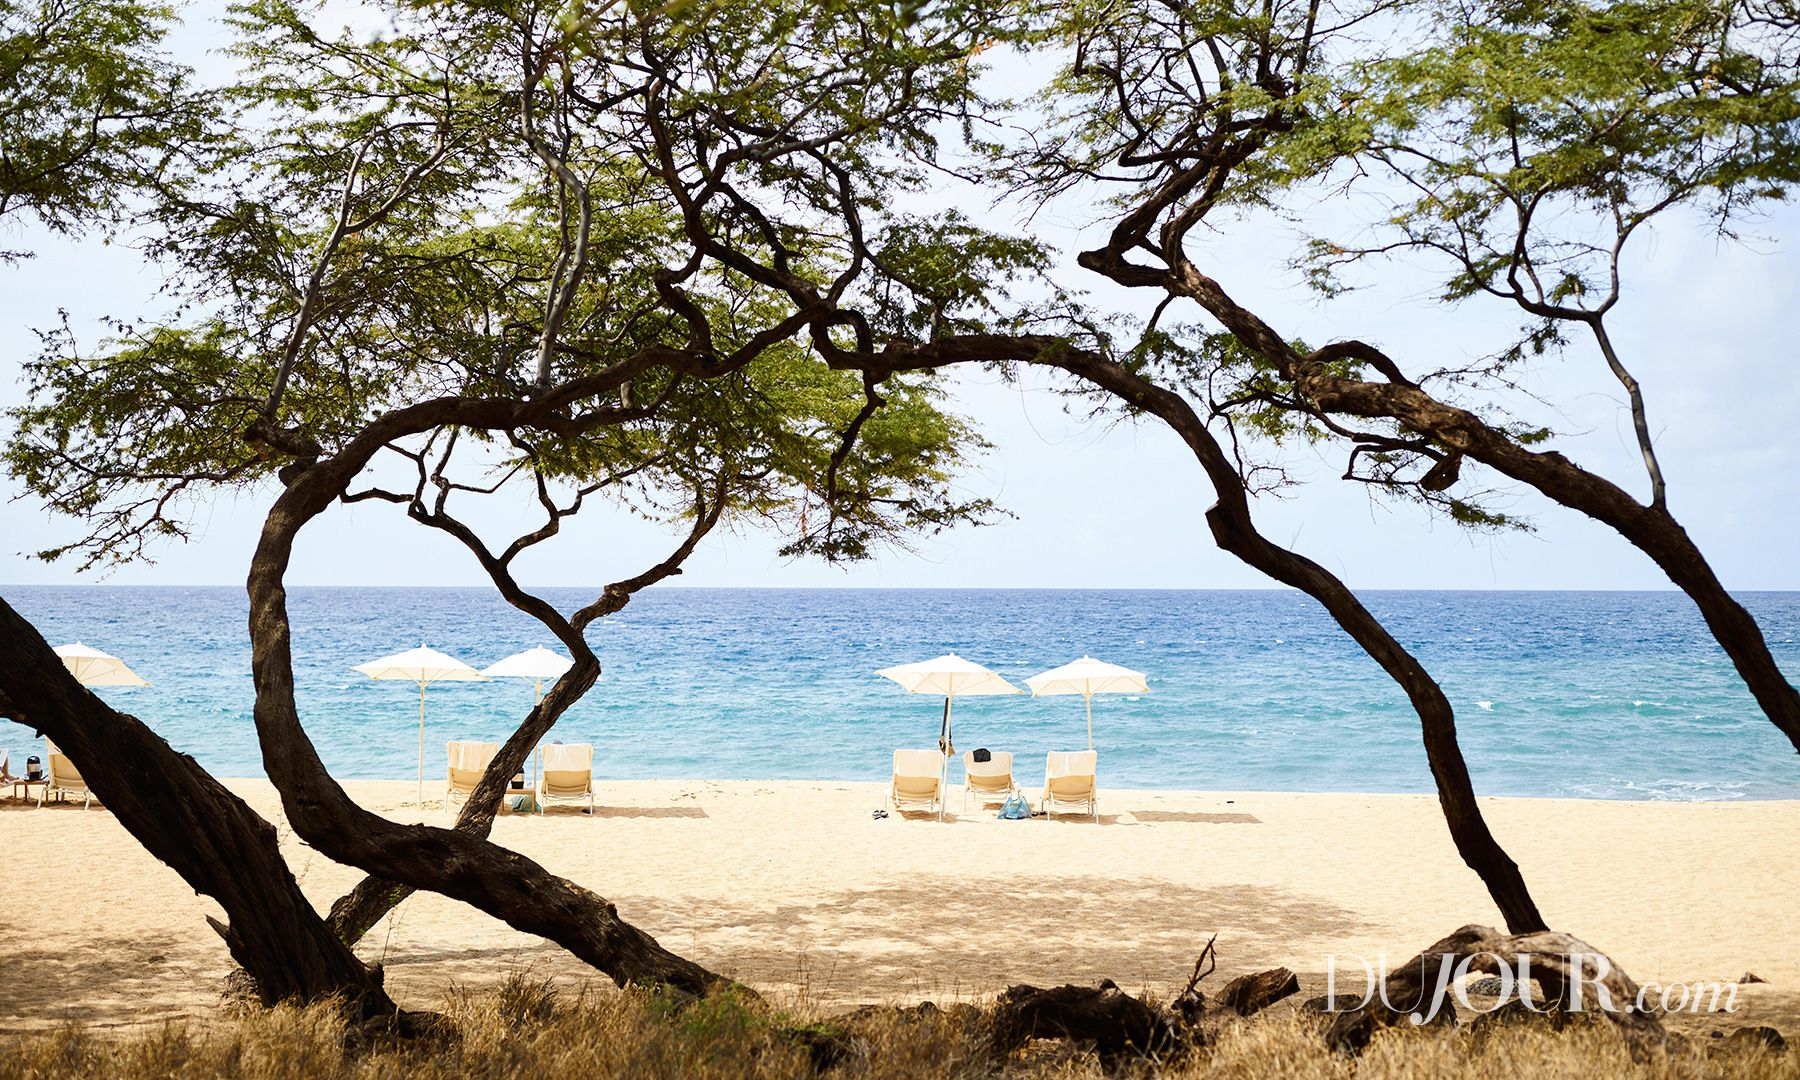 Lanai Hawaii Tourist Attractions